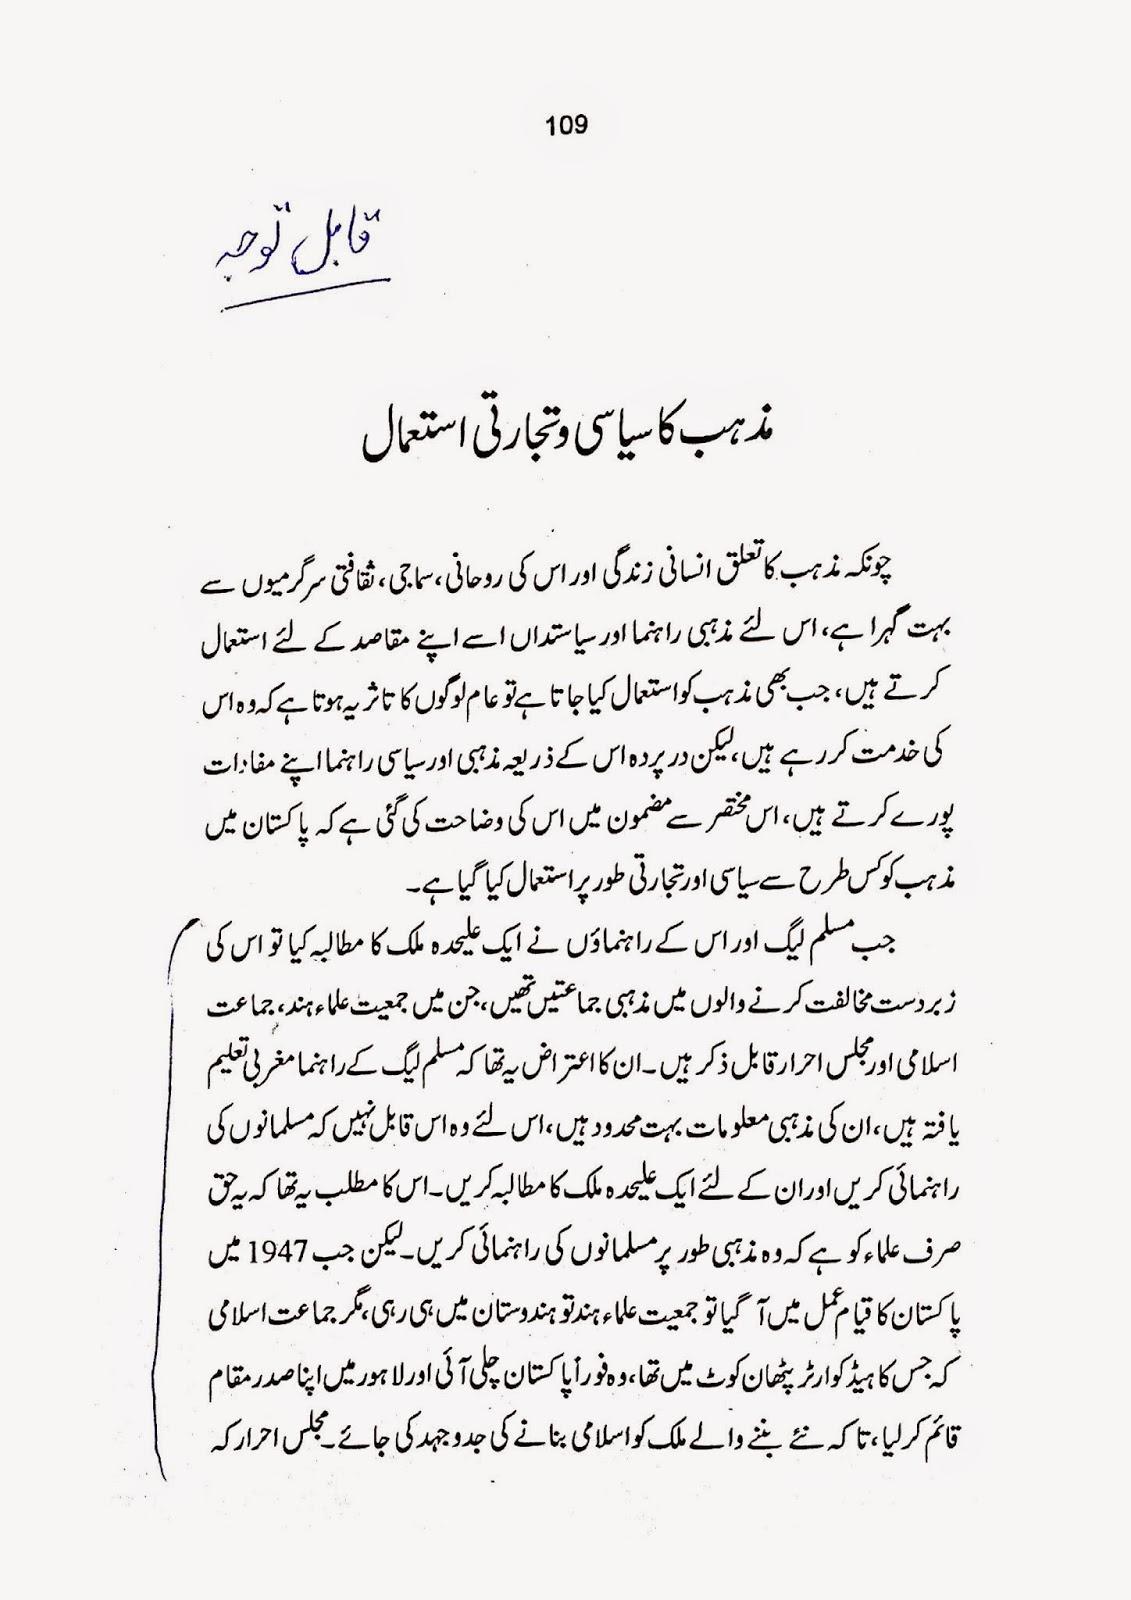 Mazhab ka Siyasi wa Tijarati Estemaal By Dr. Mubarak Ali